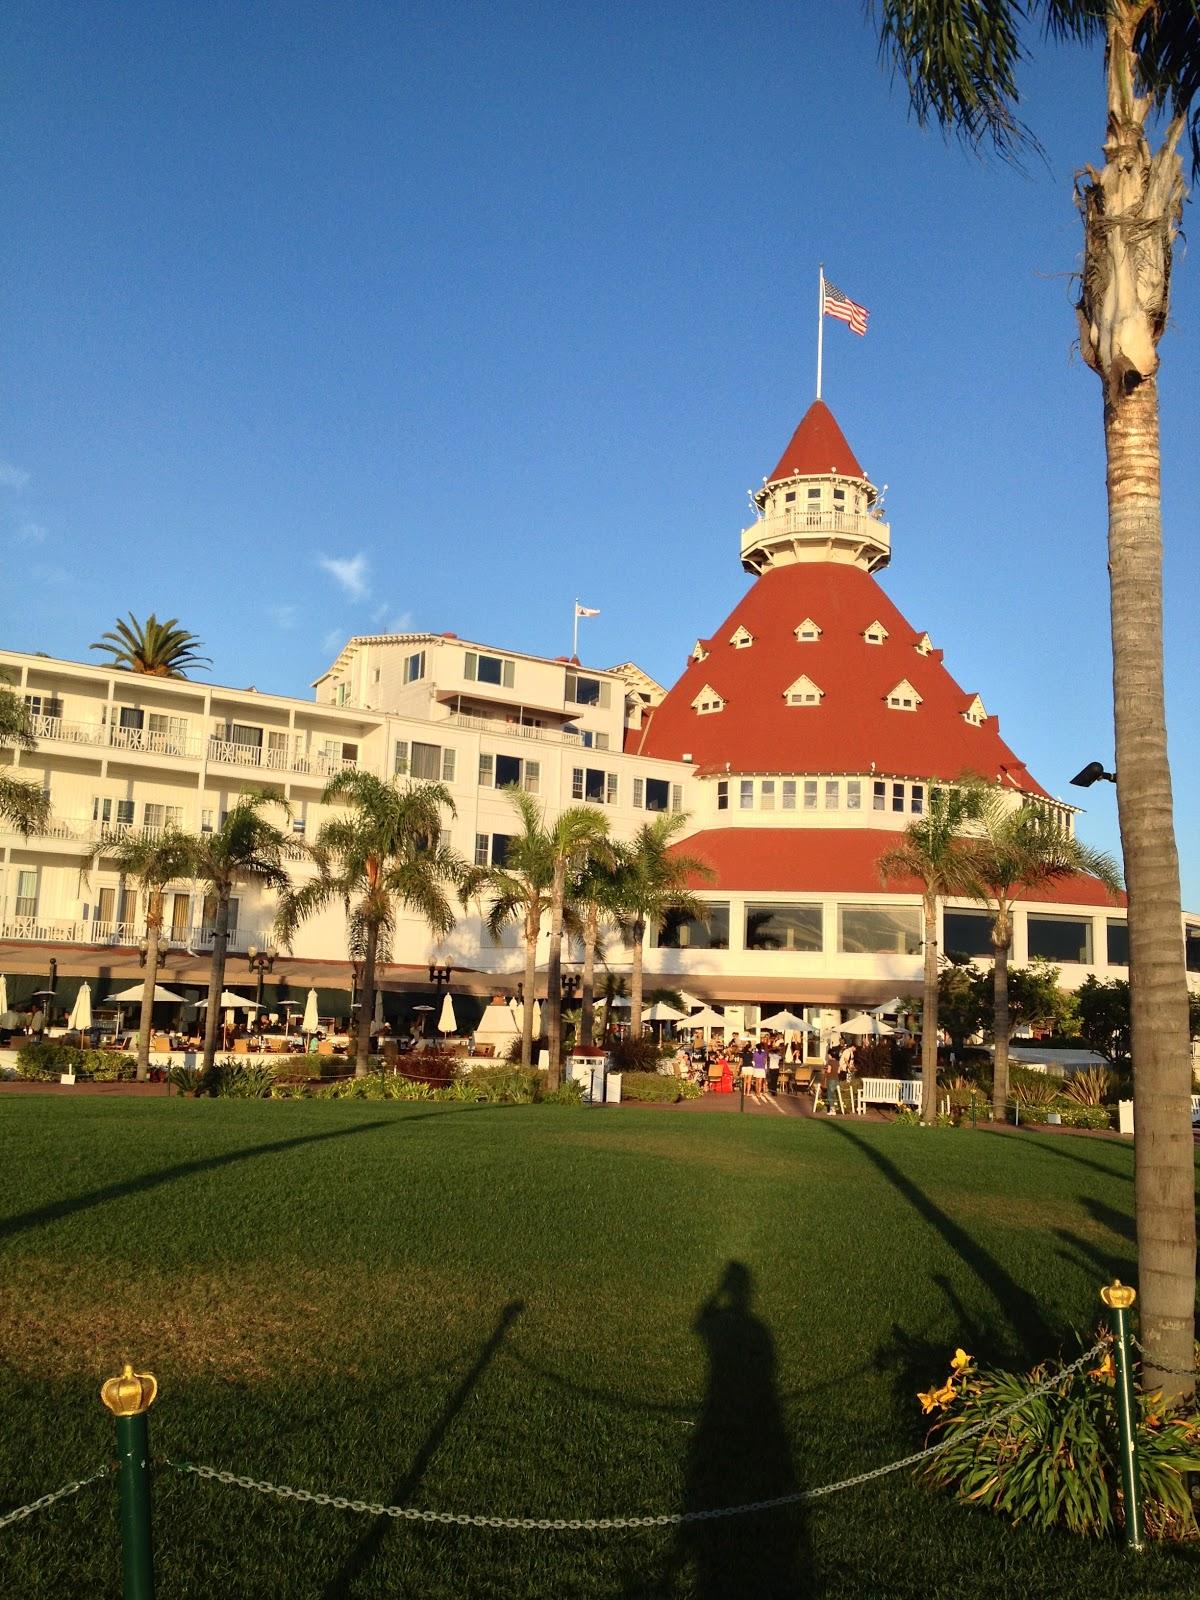 The Travelling Gypsy: Coronado Island & Hotel Del